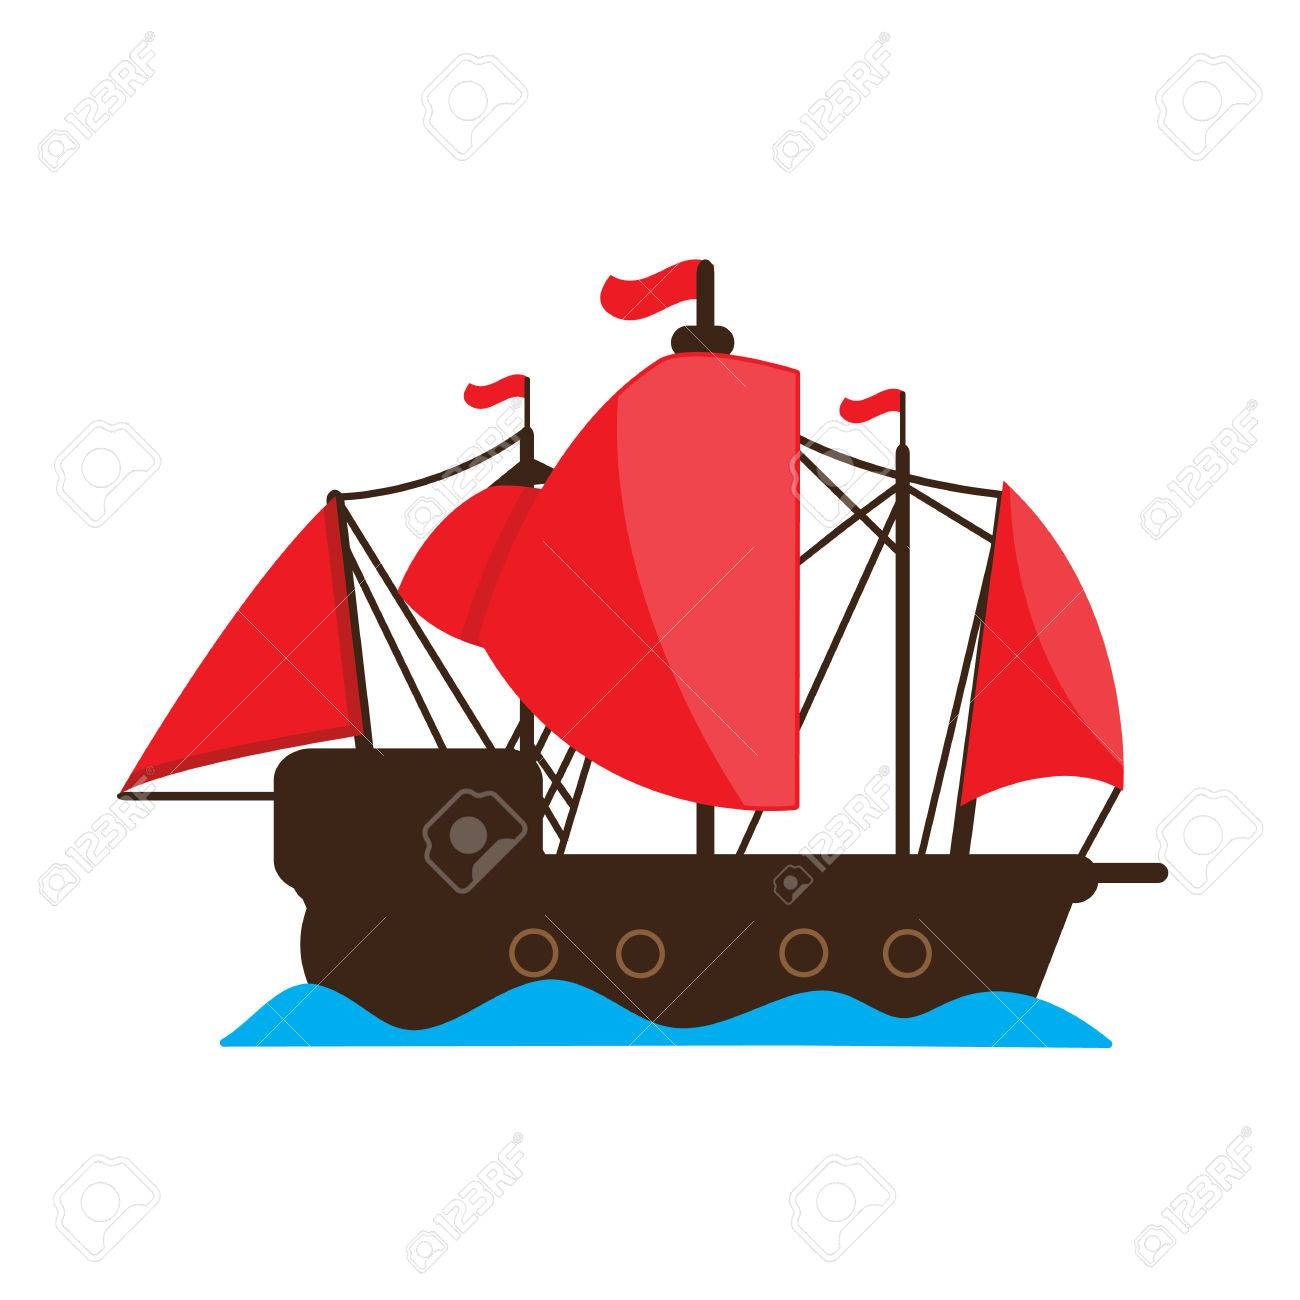 chinese junk ship vector cartoon design royalty free cliparts rh 123rf com ship victoria reed ship victory